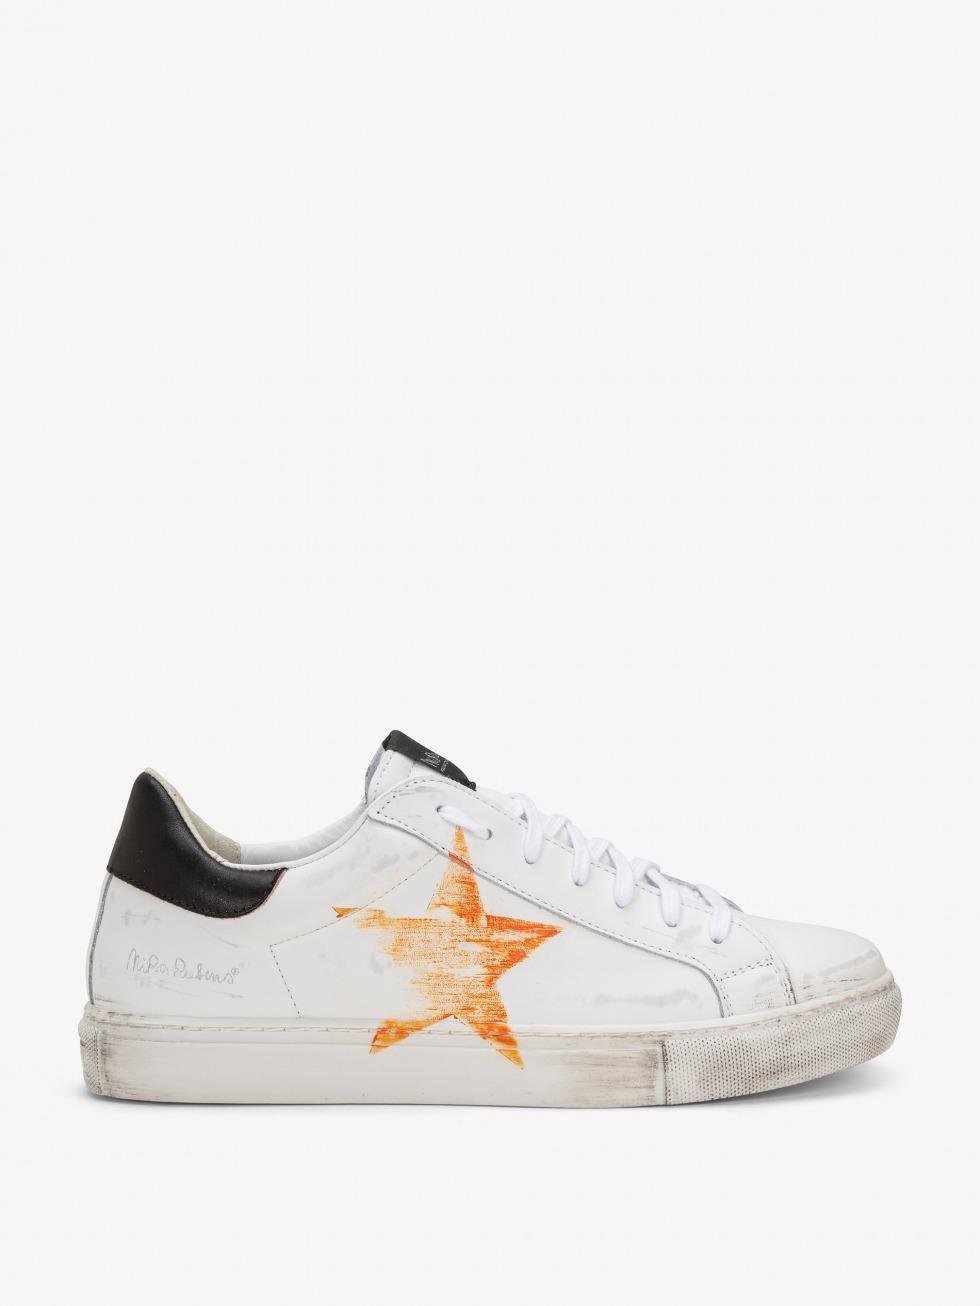 Martini M Sneakers Vintage City - Orange Star